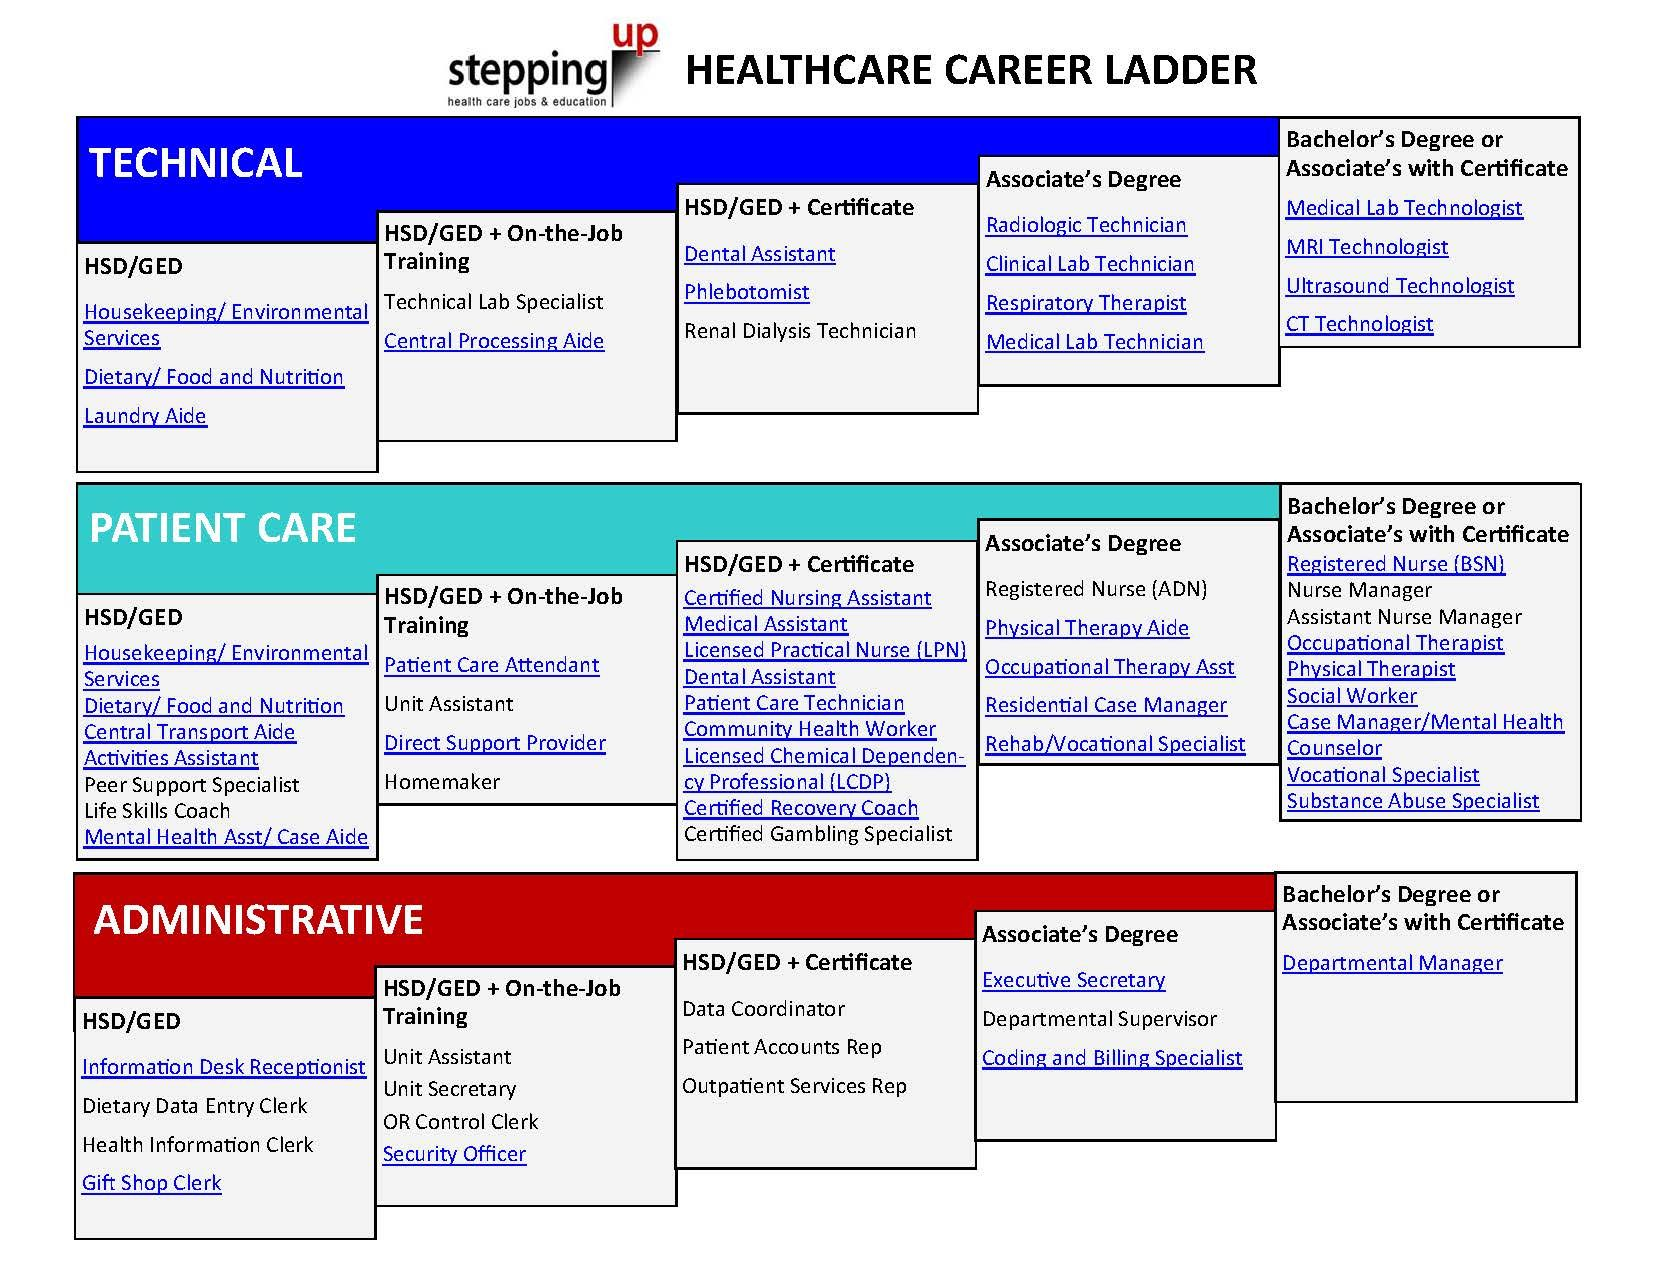 Healthcare Career Ladder